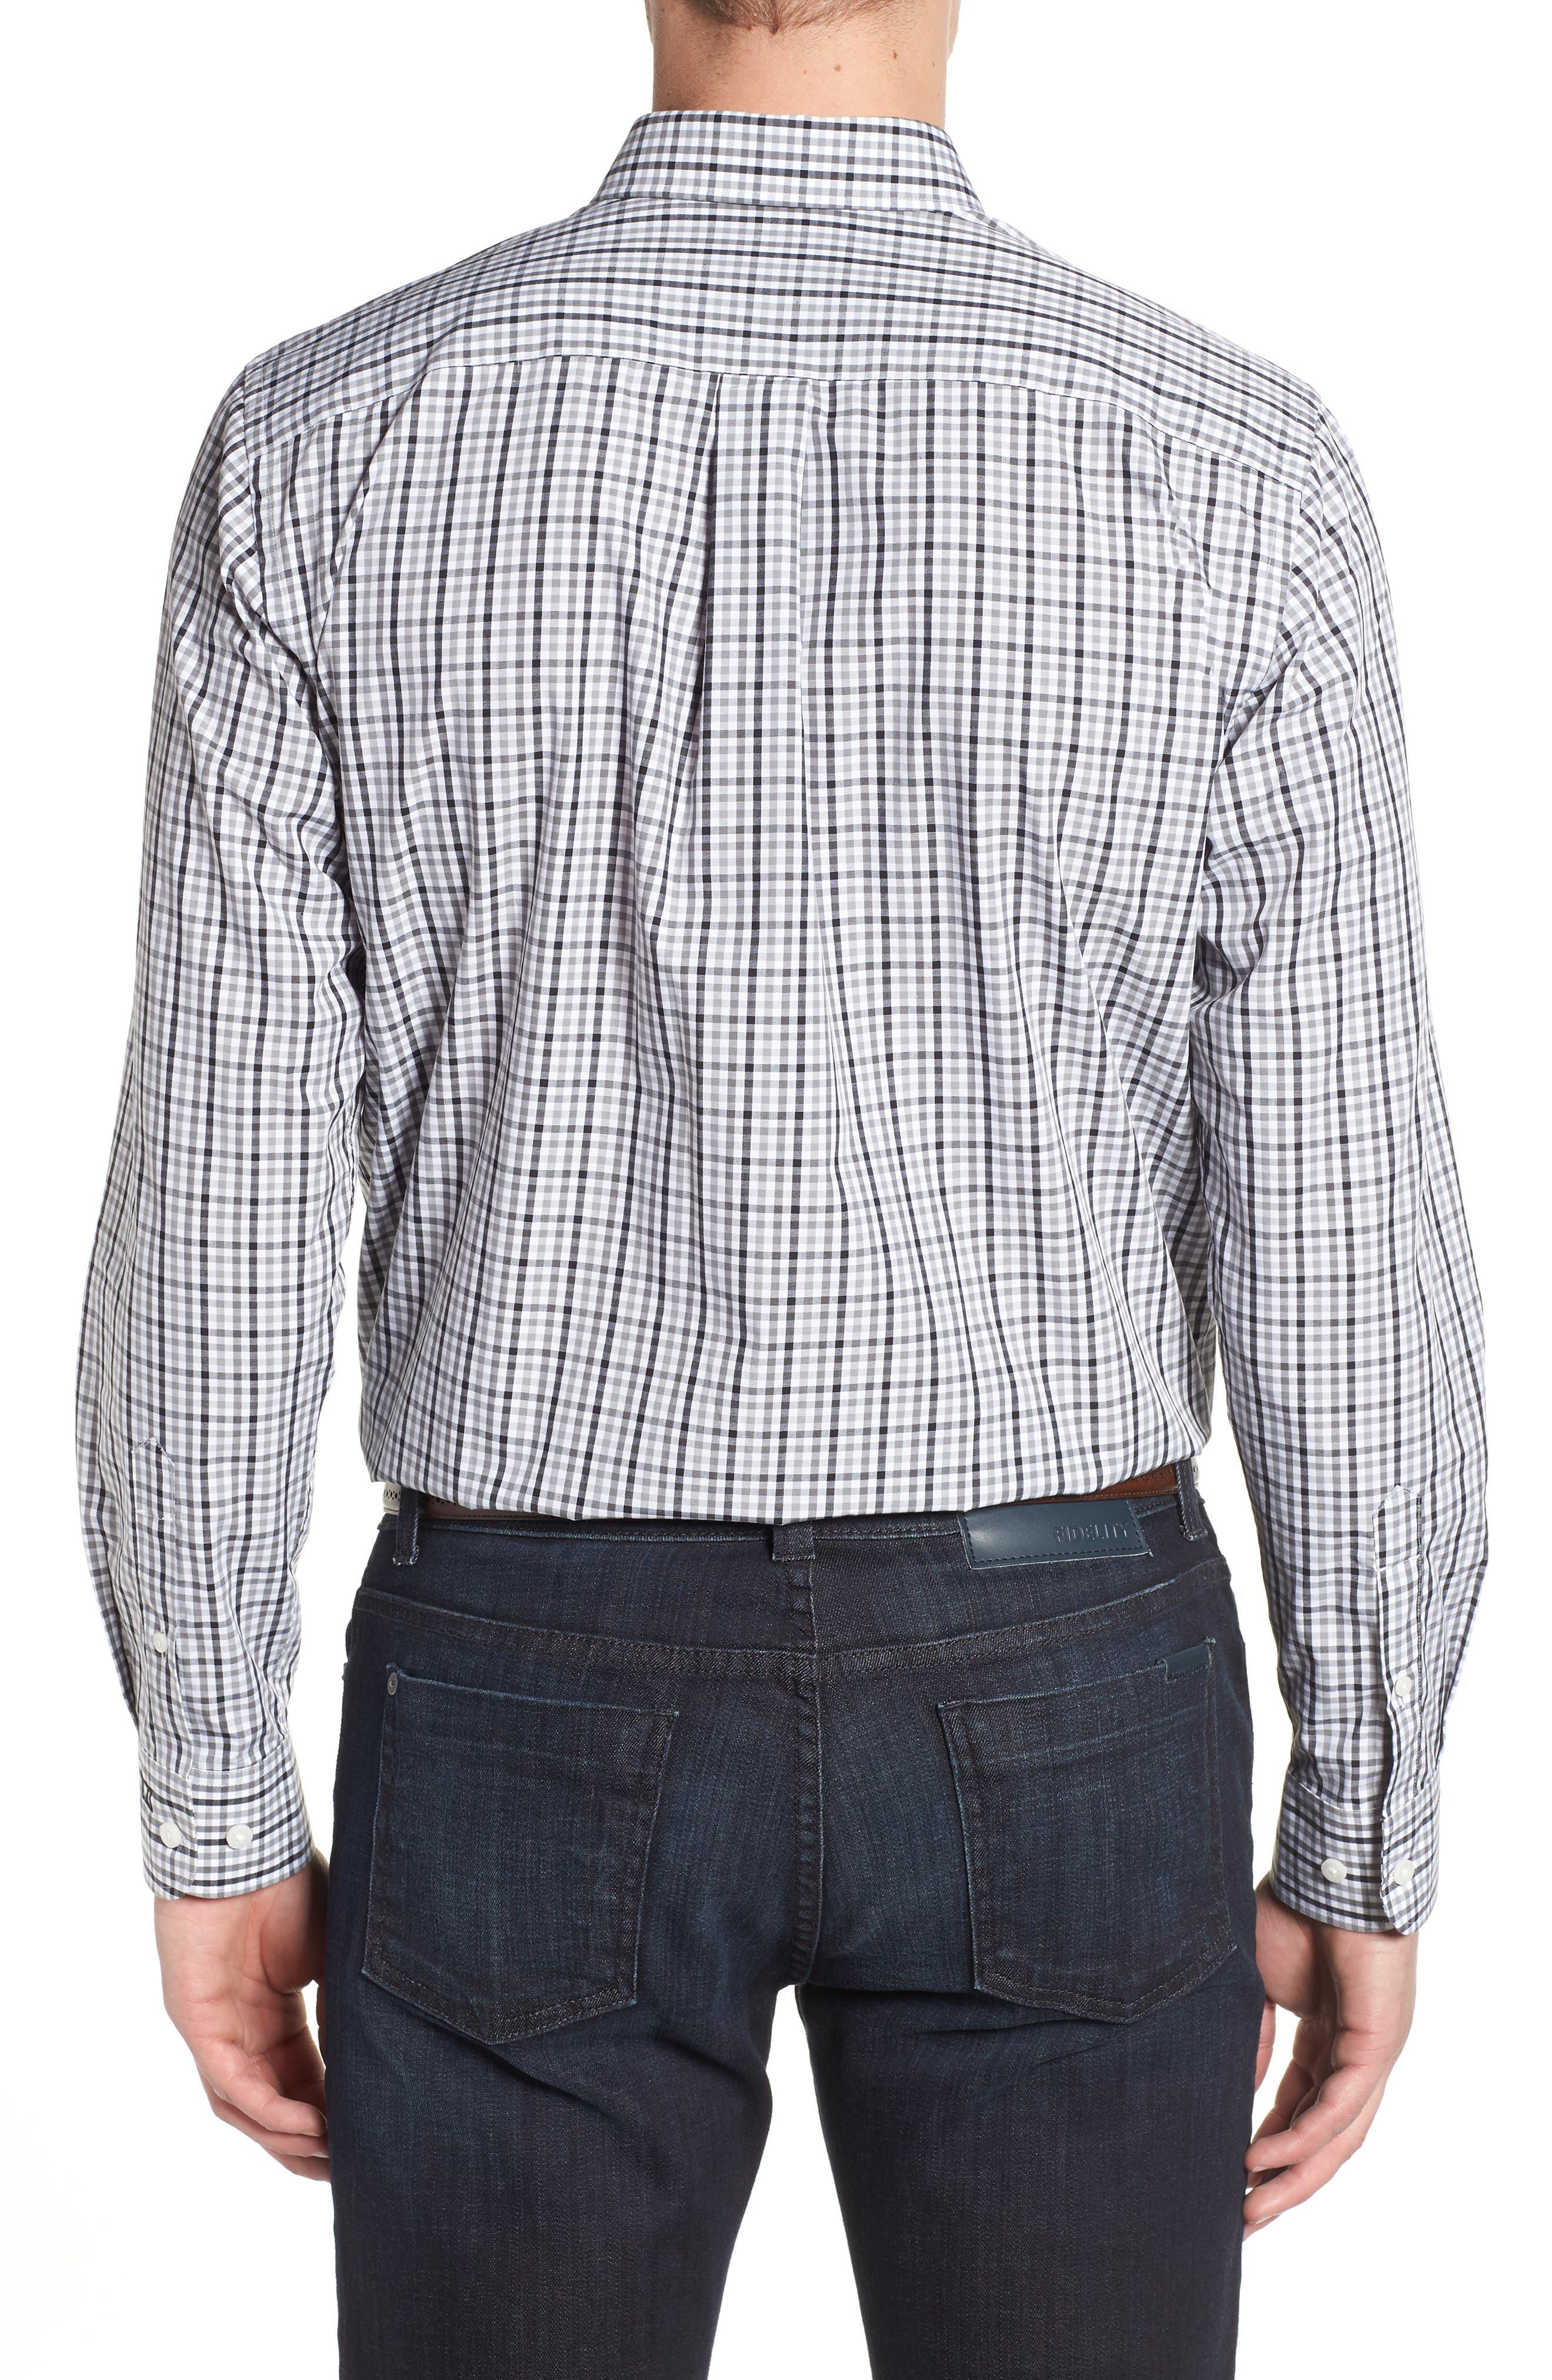 Carolina Panthers - Gilman Regular Fit Plaid Sport Shirt,                             Alternate thumbnail 2, color,                             BLACK